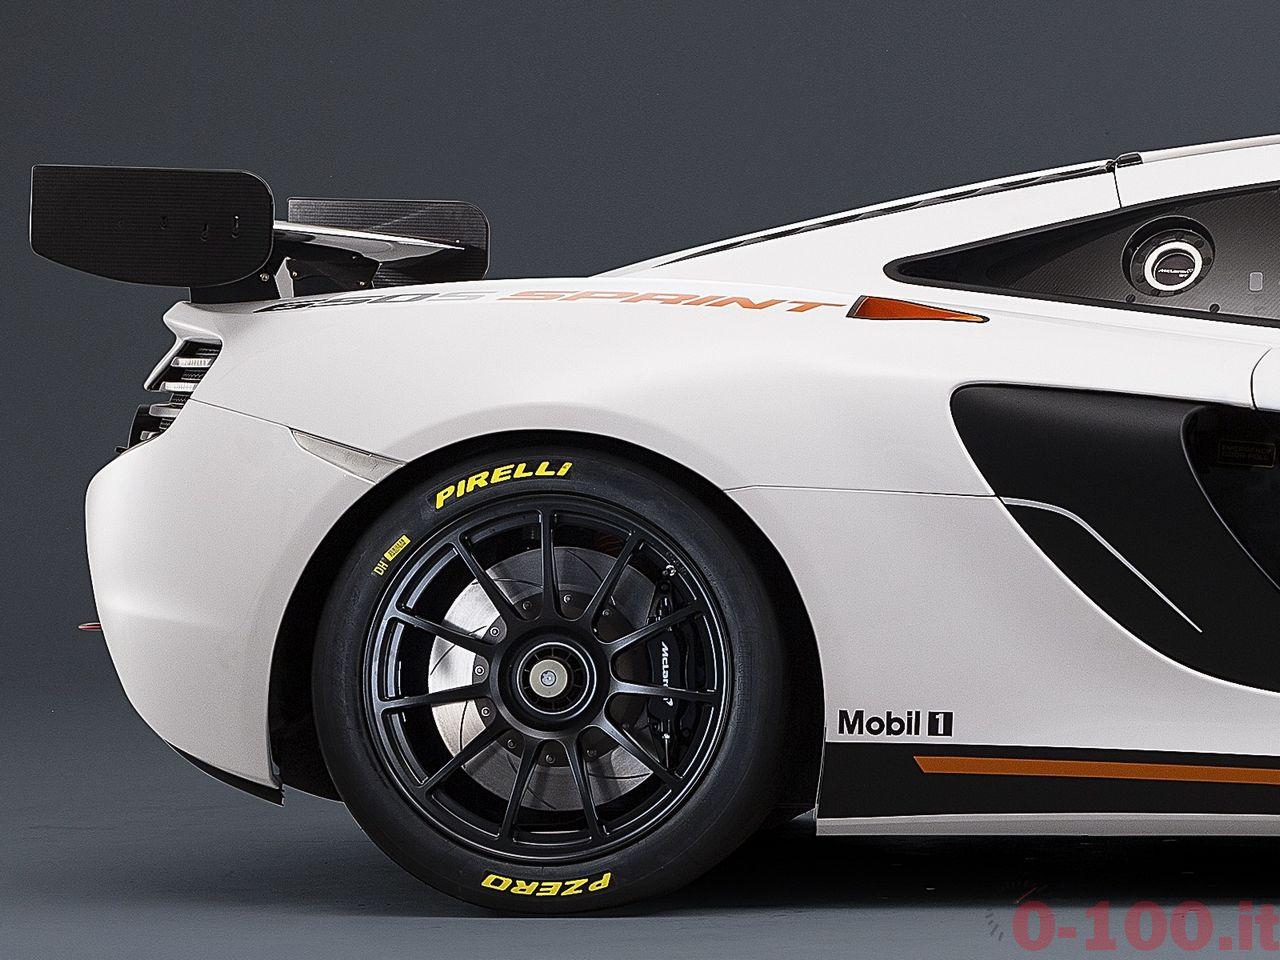 mclaren-650s-sprint-0-100-price-prezzo_10